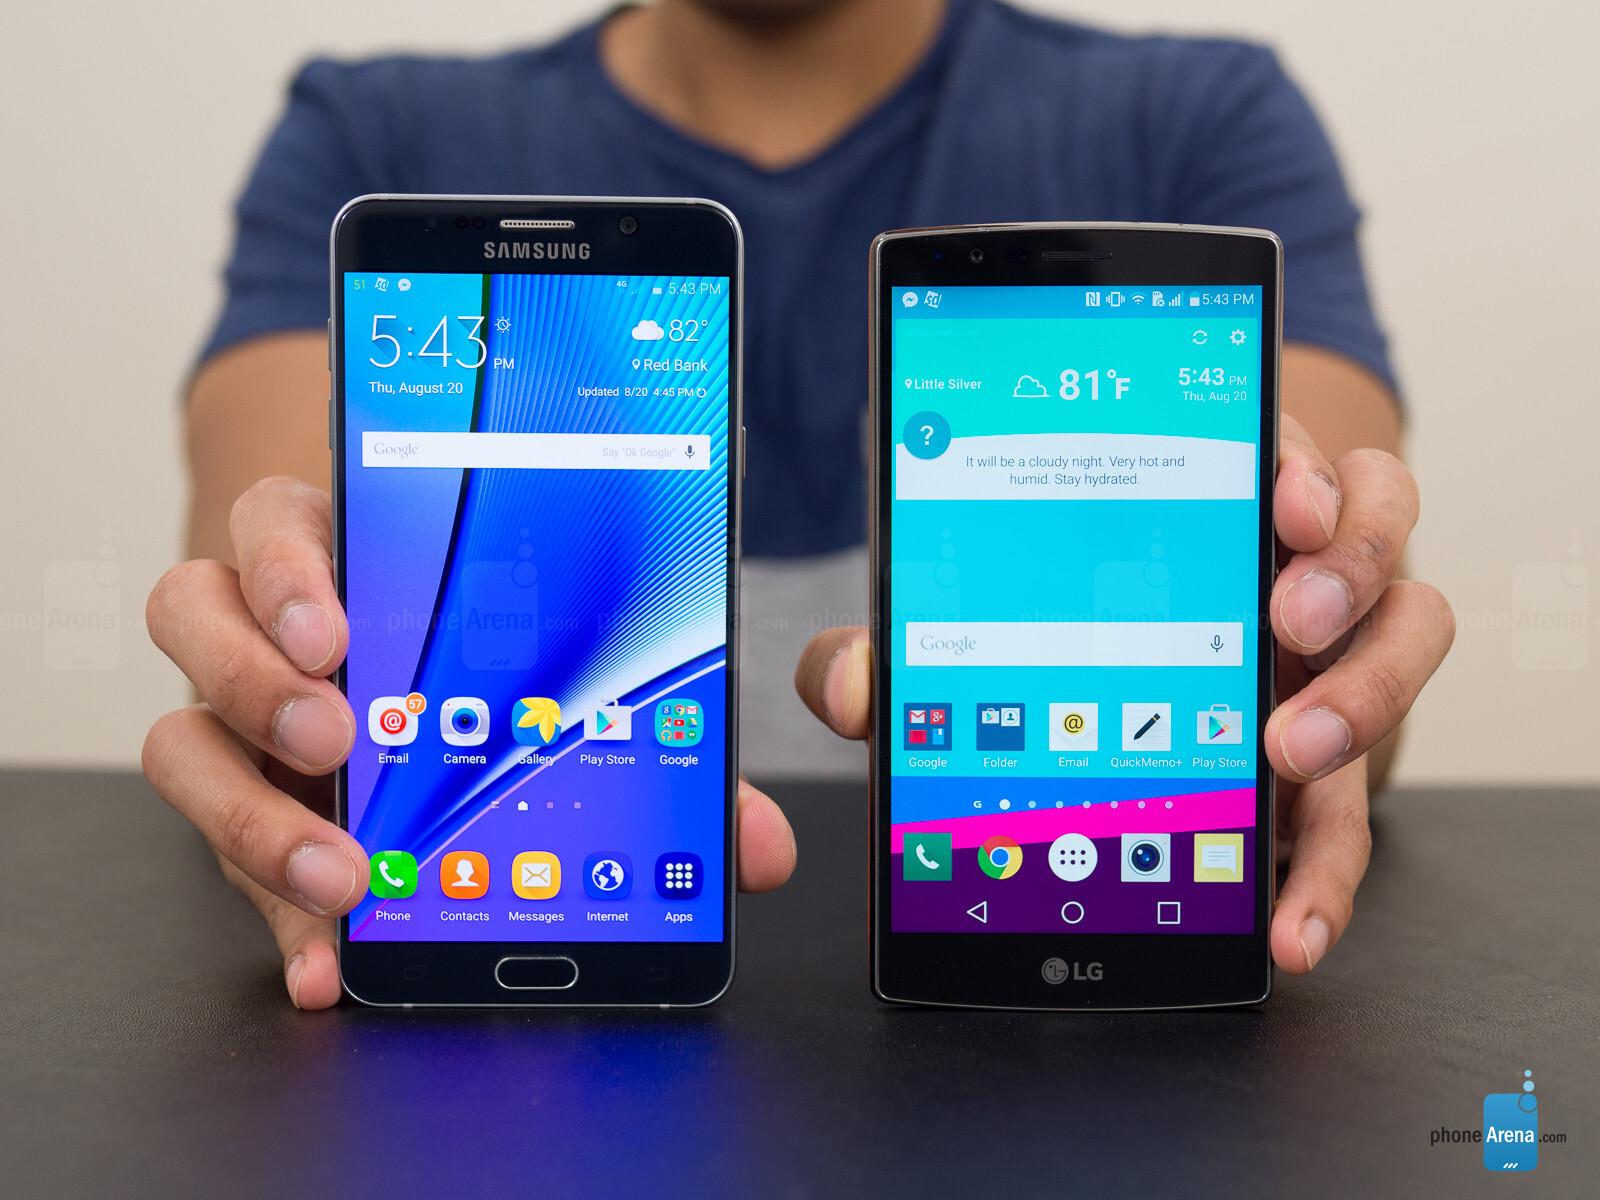 Lg G4 Vs Galaxy S7 Edge: Samsung Galaxy Note5 Vs LG G4